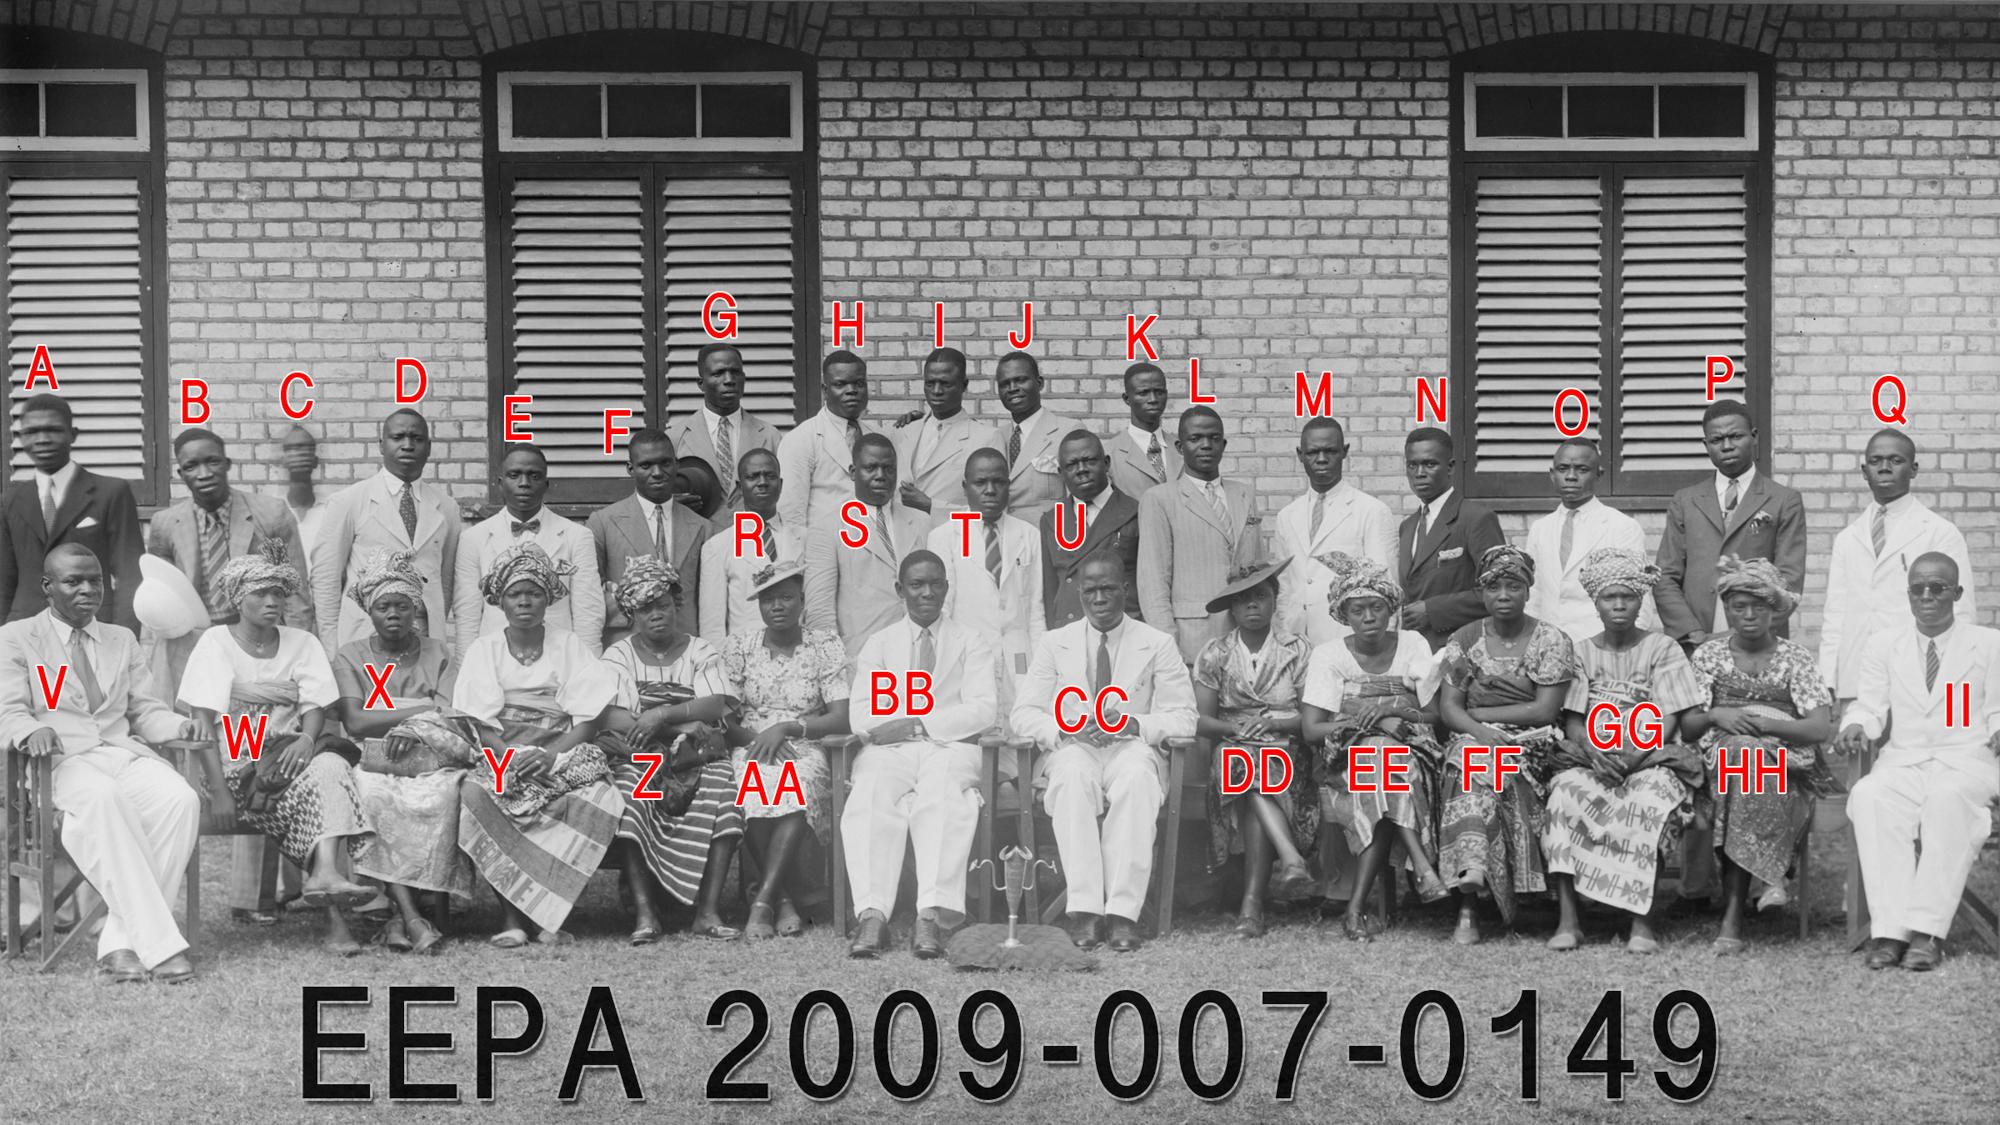 EEPA_2009-007-0149-M.jpg